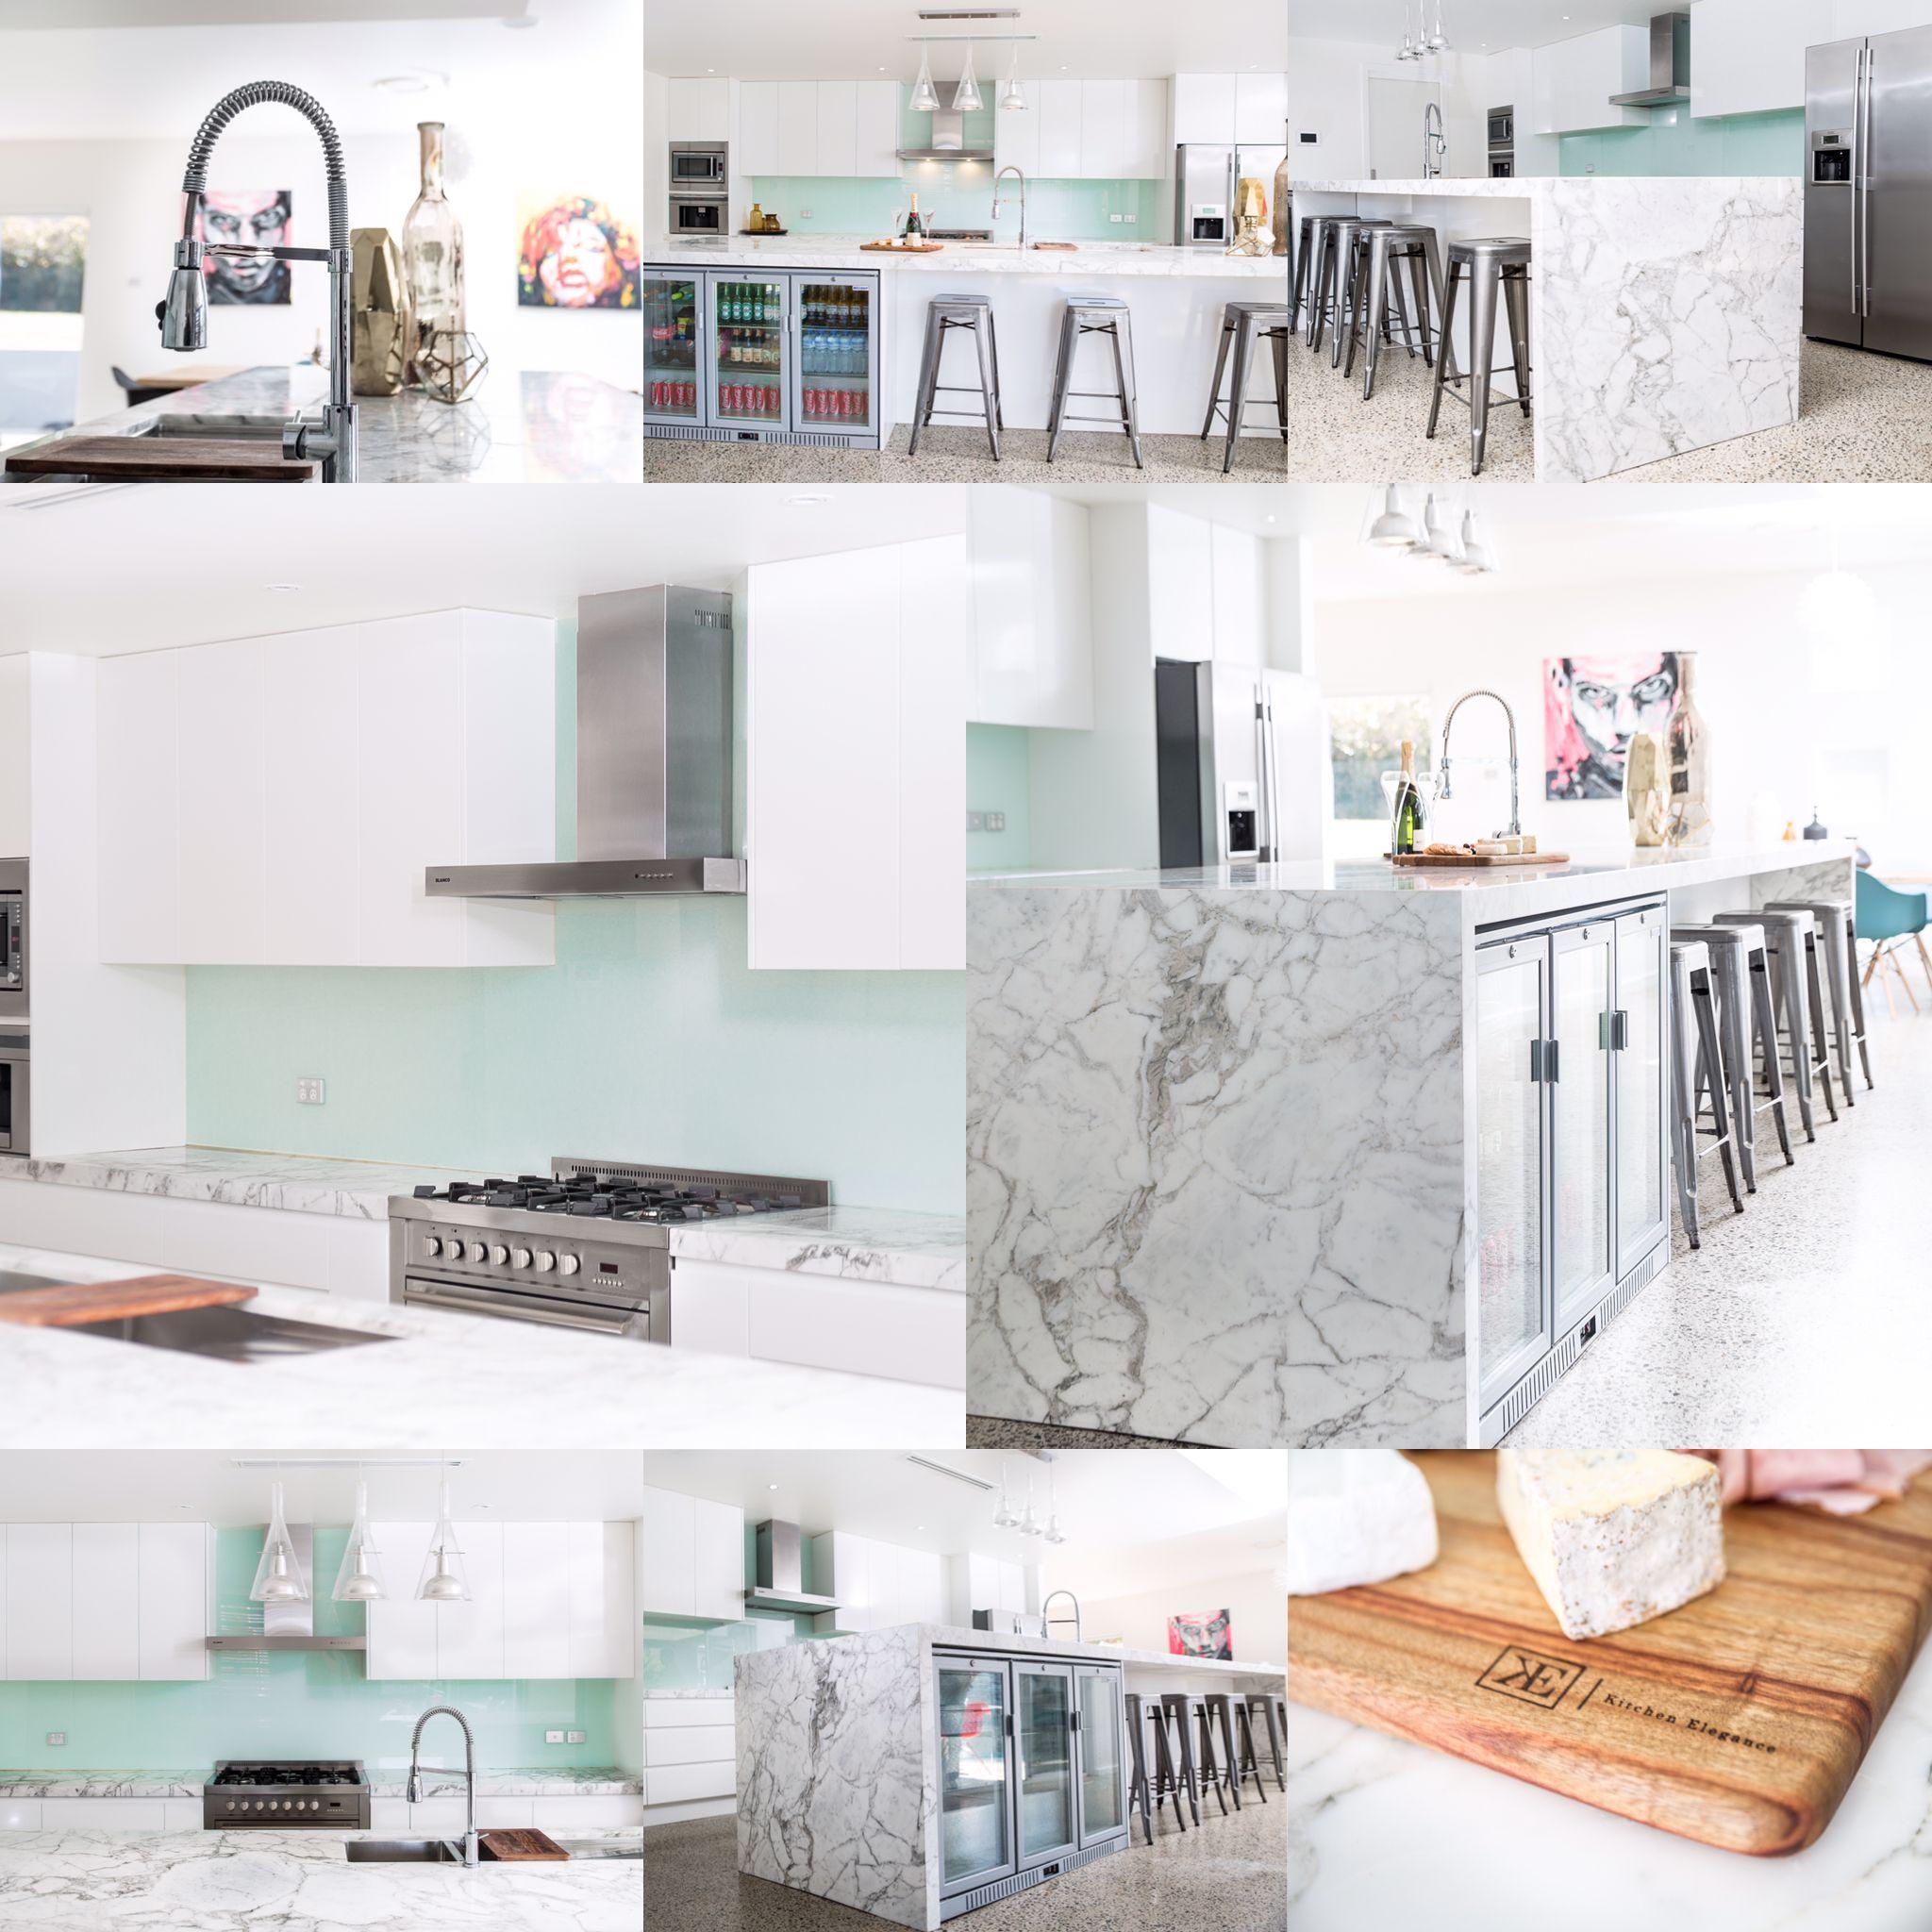 Carrara Marble Kitchen Benchtops: Designer White Luxury Kitchen In Sydney, Private Residence. Open Plan Carrara Marble Bench